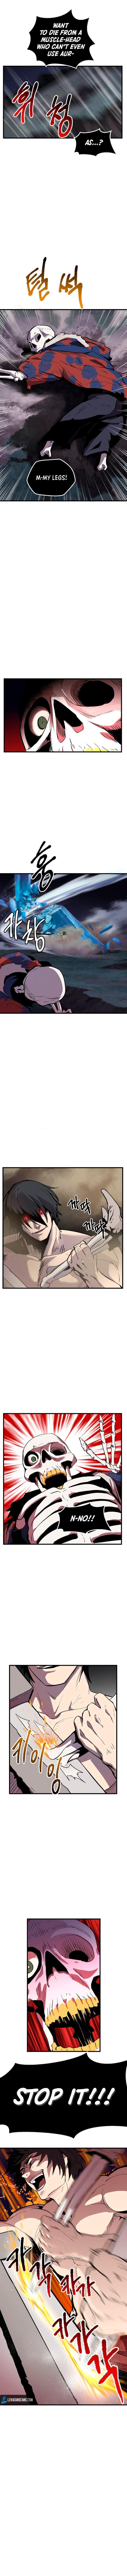 Survival Story Of A Sword King In A Fantasy World Chapter 21 page 3 - Mangakakalots.com